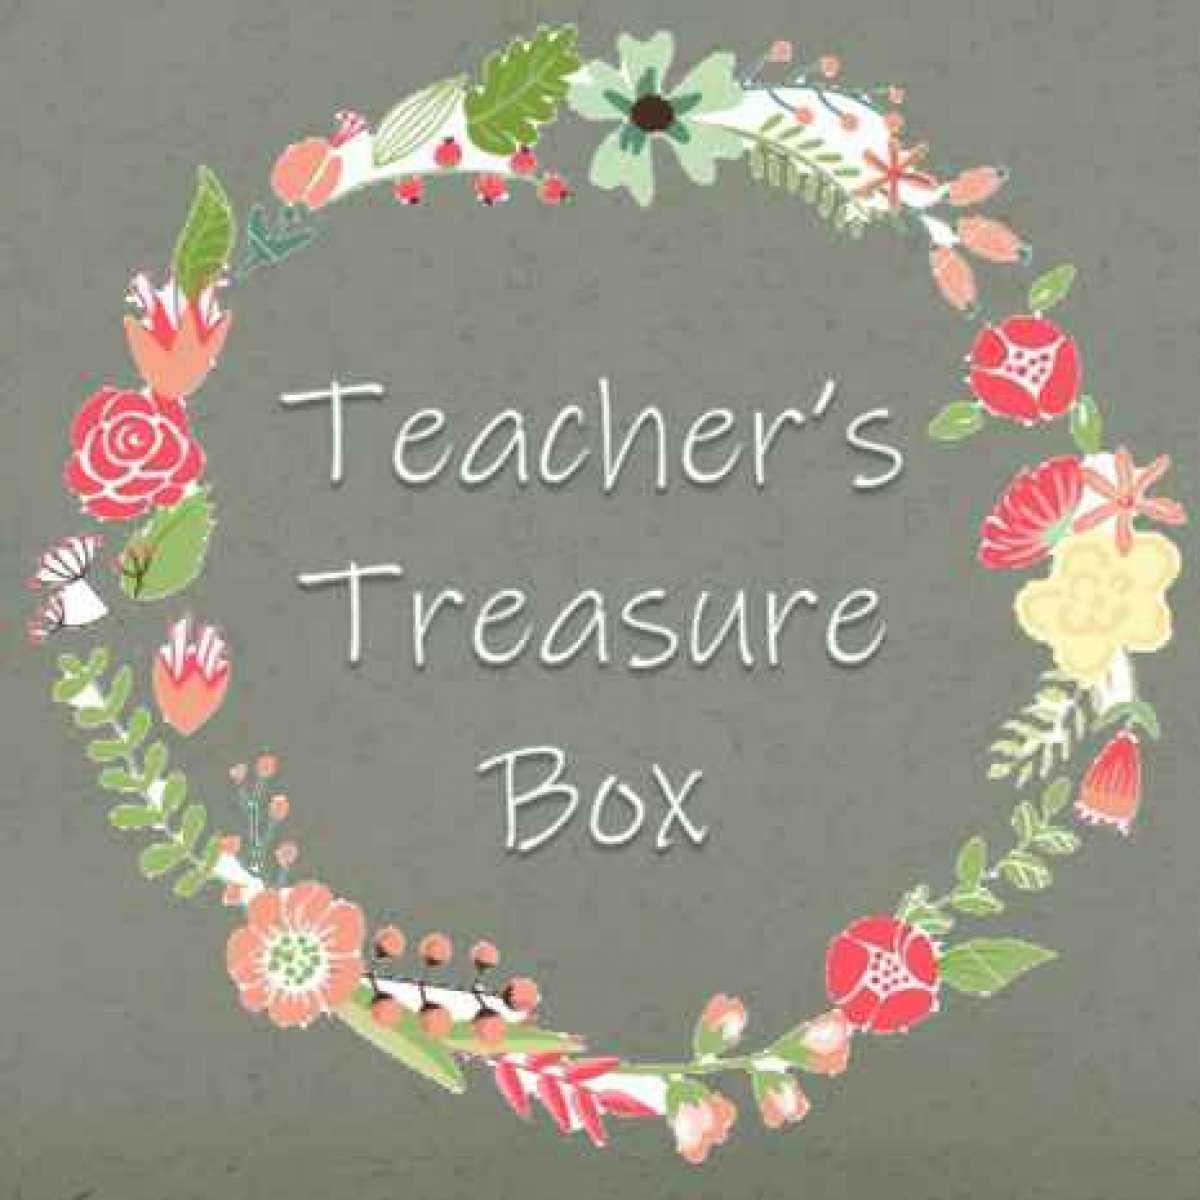 Teacher's Treasure Box